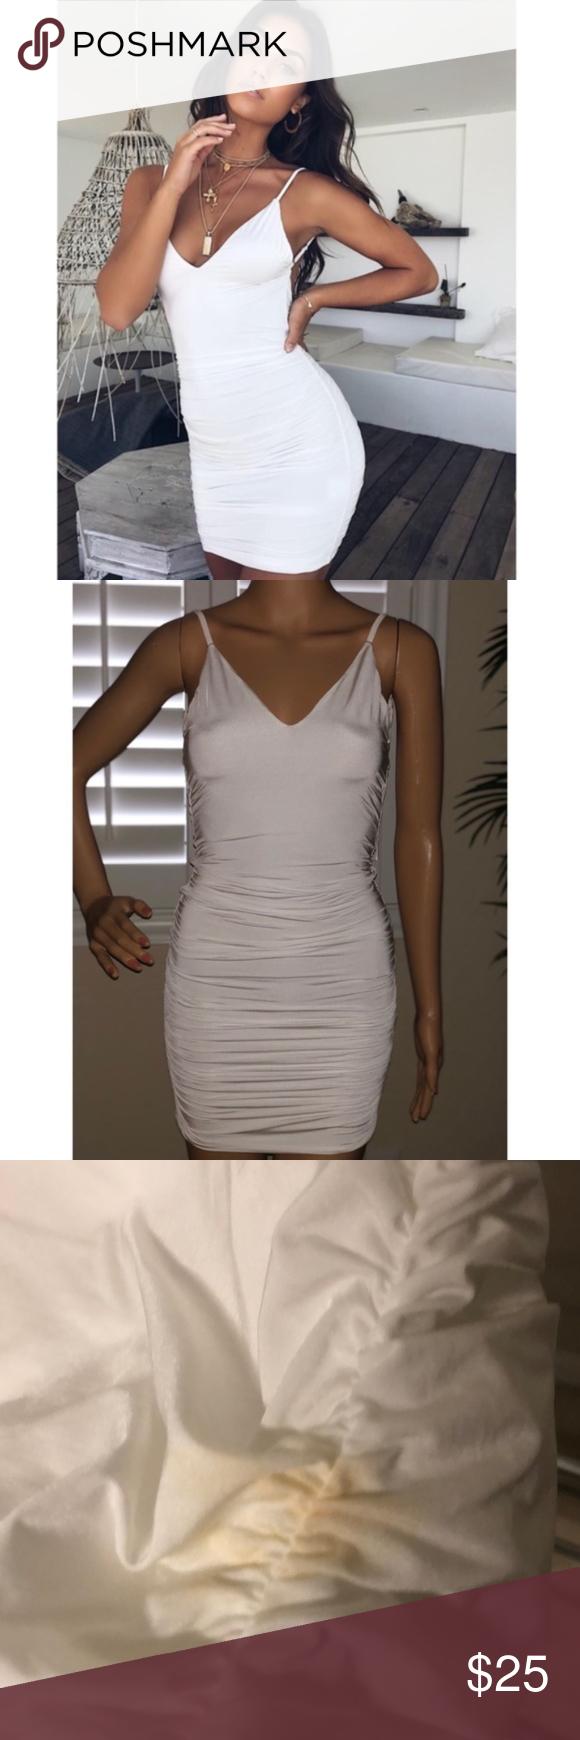 Tiger Mist Ally Dress White Xs Stretchy Dress Tiger Mist Dress White Dress [ 1740 x 580 Pixel ]